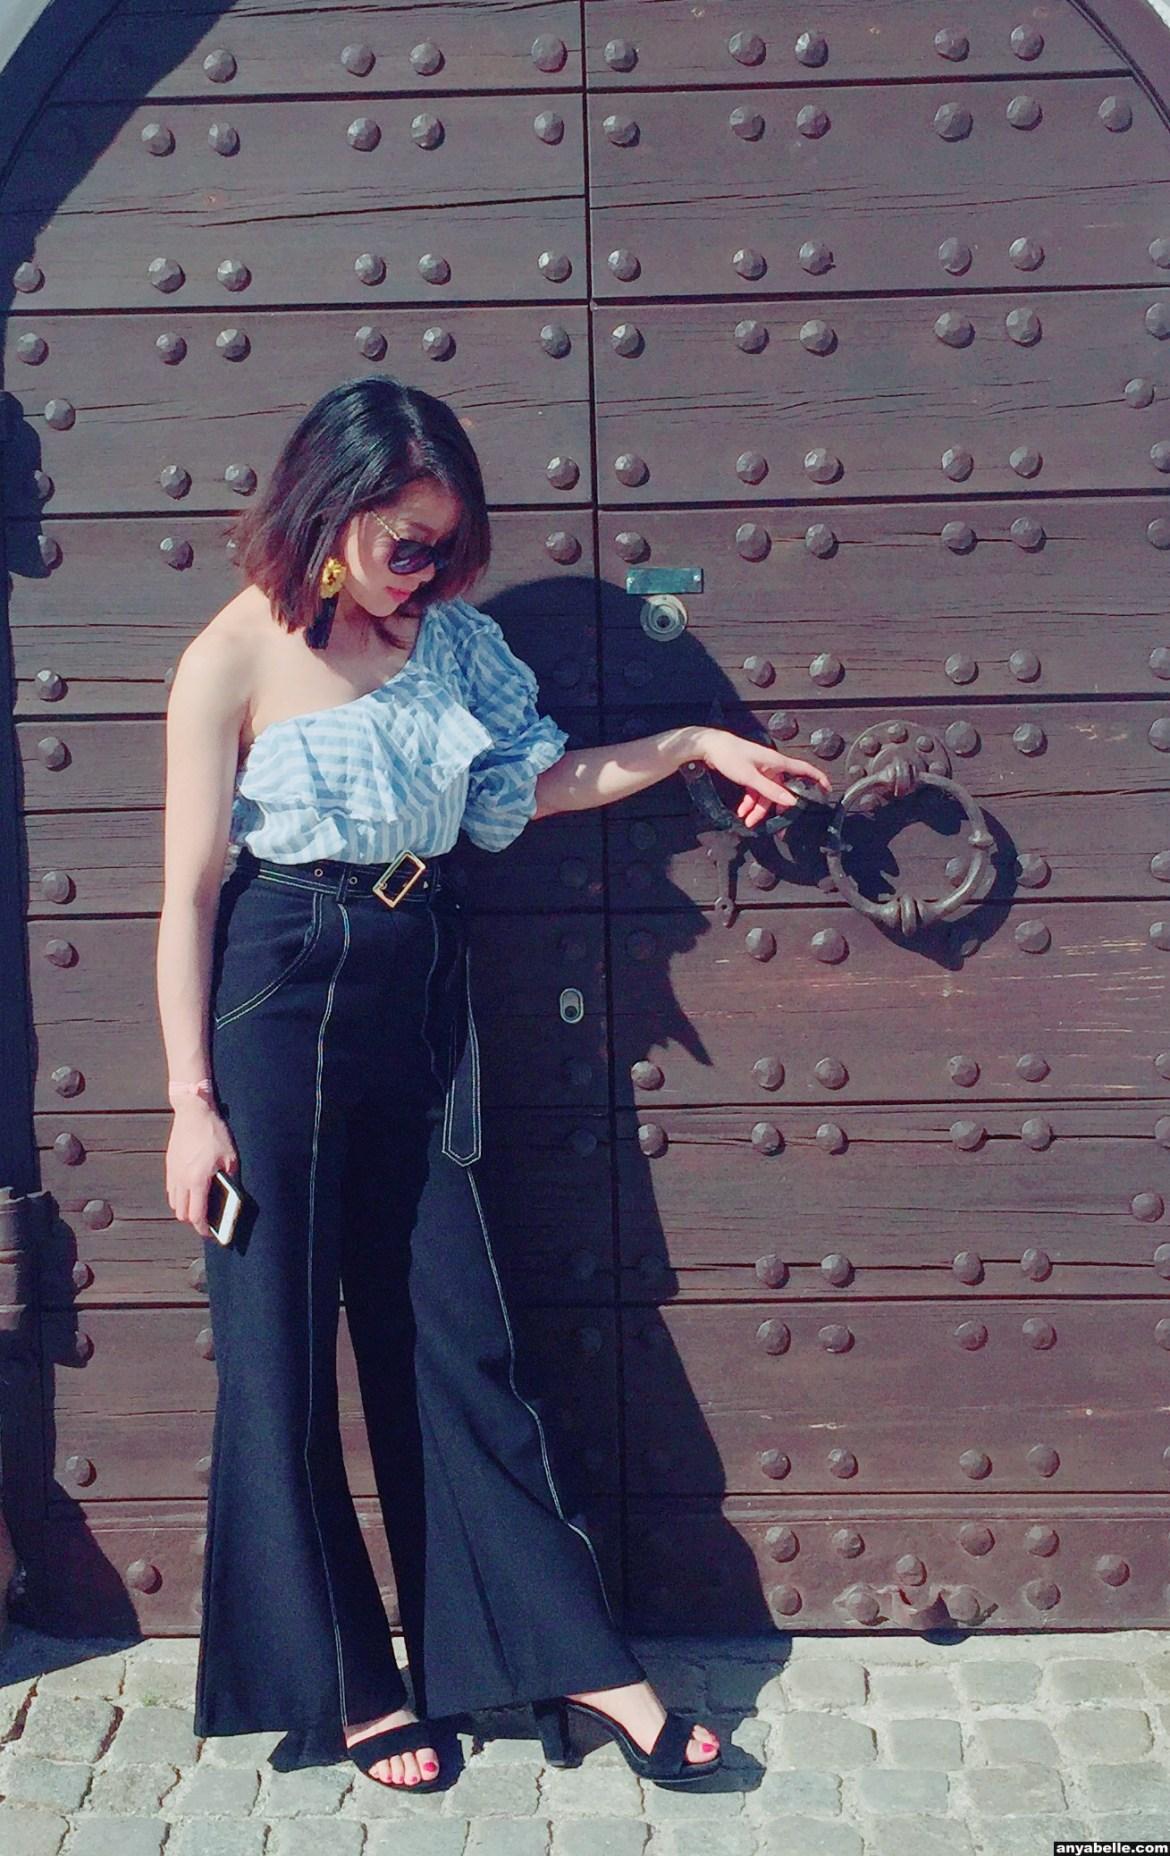 OOTD,Blogger,Street Style, Style,Lifestyle, Outfits, Fashion,Flower, Magnolia 每日穿搭,时尚博主,生活方式,街拍,风格, 穿搭,时尚,鲜花,玉兰花